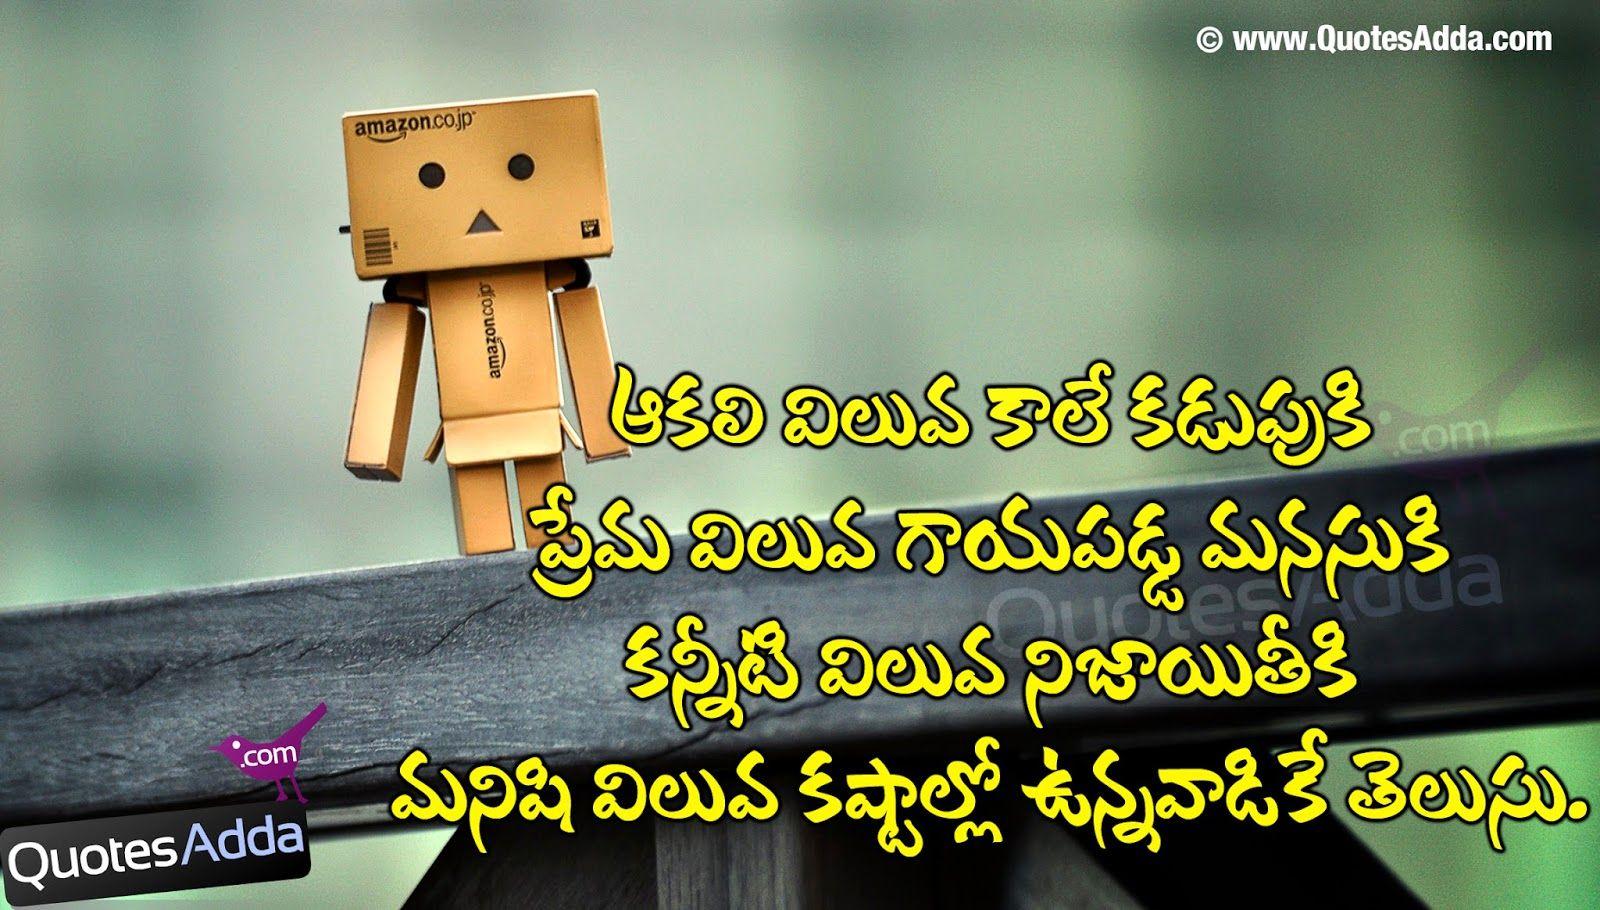 Telugu Alone Life Quotations Wallpapers Quotes Adda Telugu